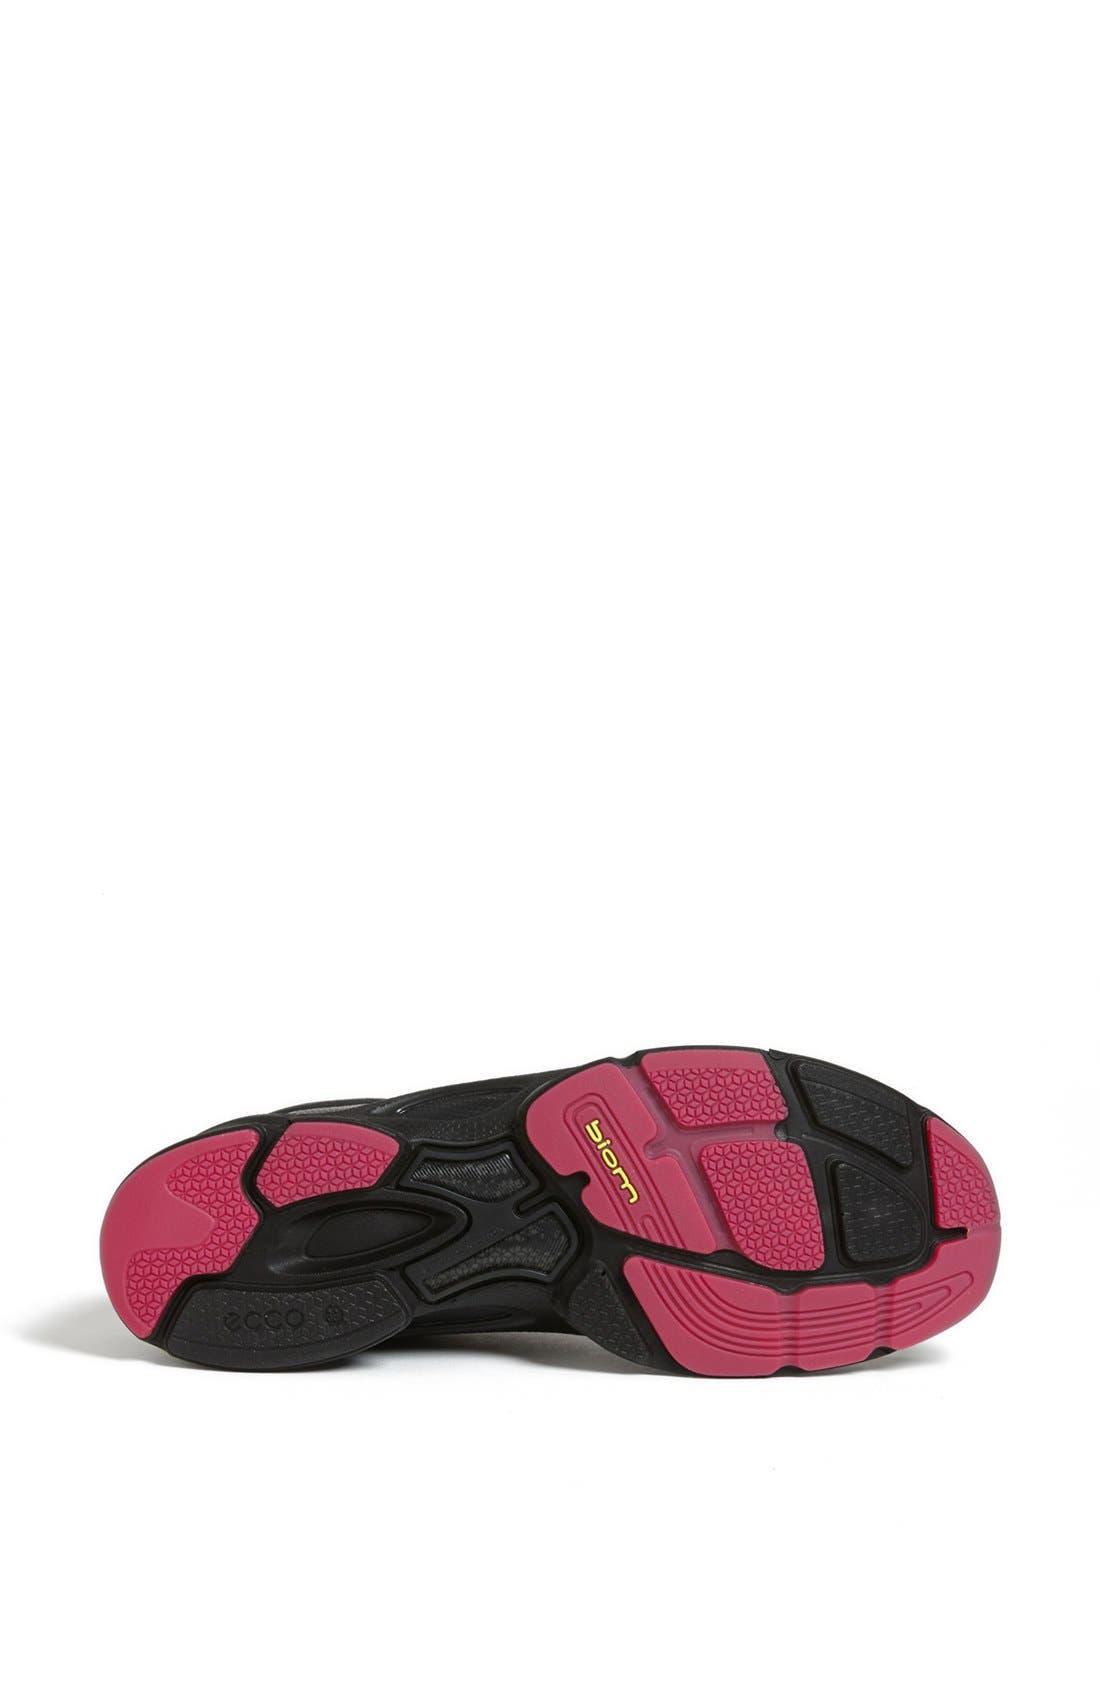 Alternate Image 2  - ECCO 'Biom Evo Trainer Plus' Training Shoe (Women)